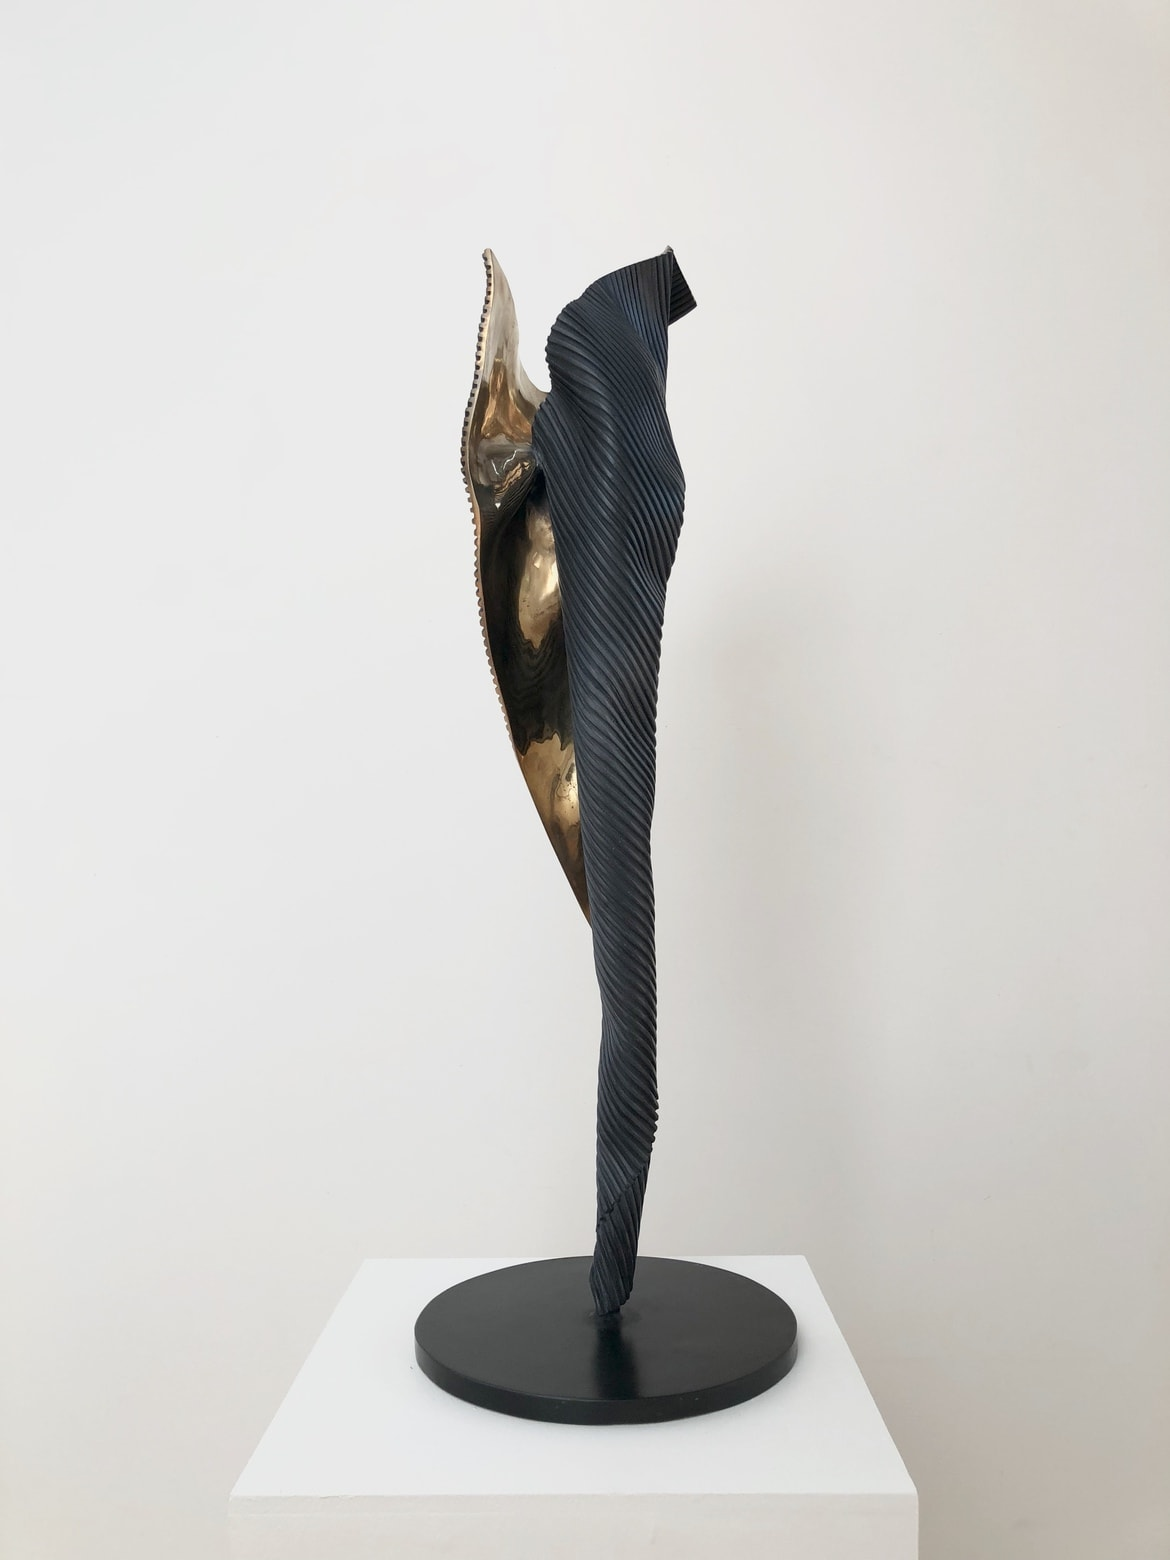 'I Am IV', 2016, bronze, 102 x 30 x 25 cm, edition of 12 + 1AP